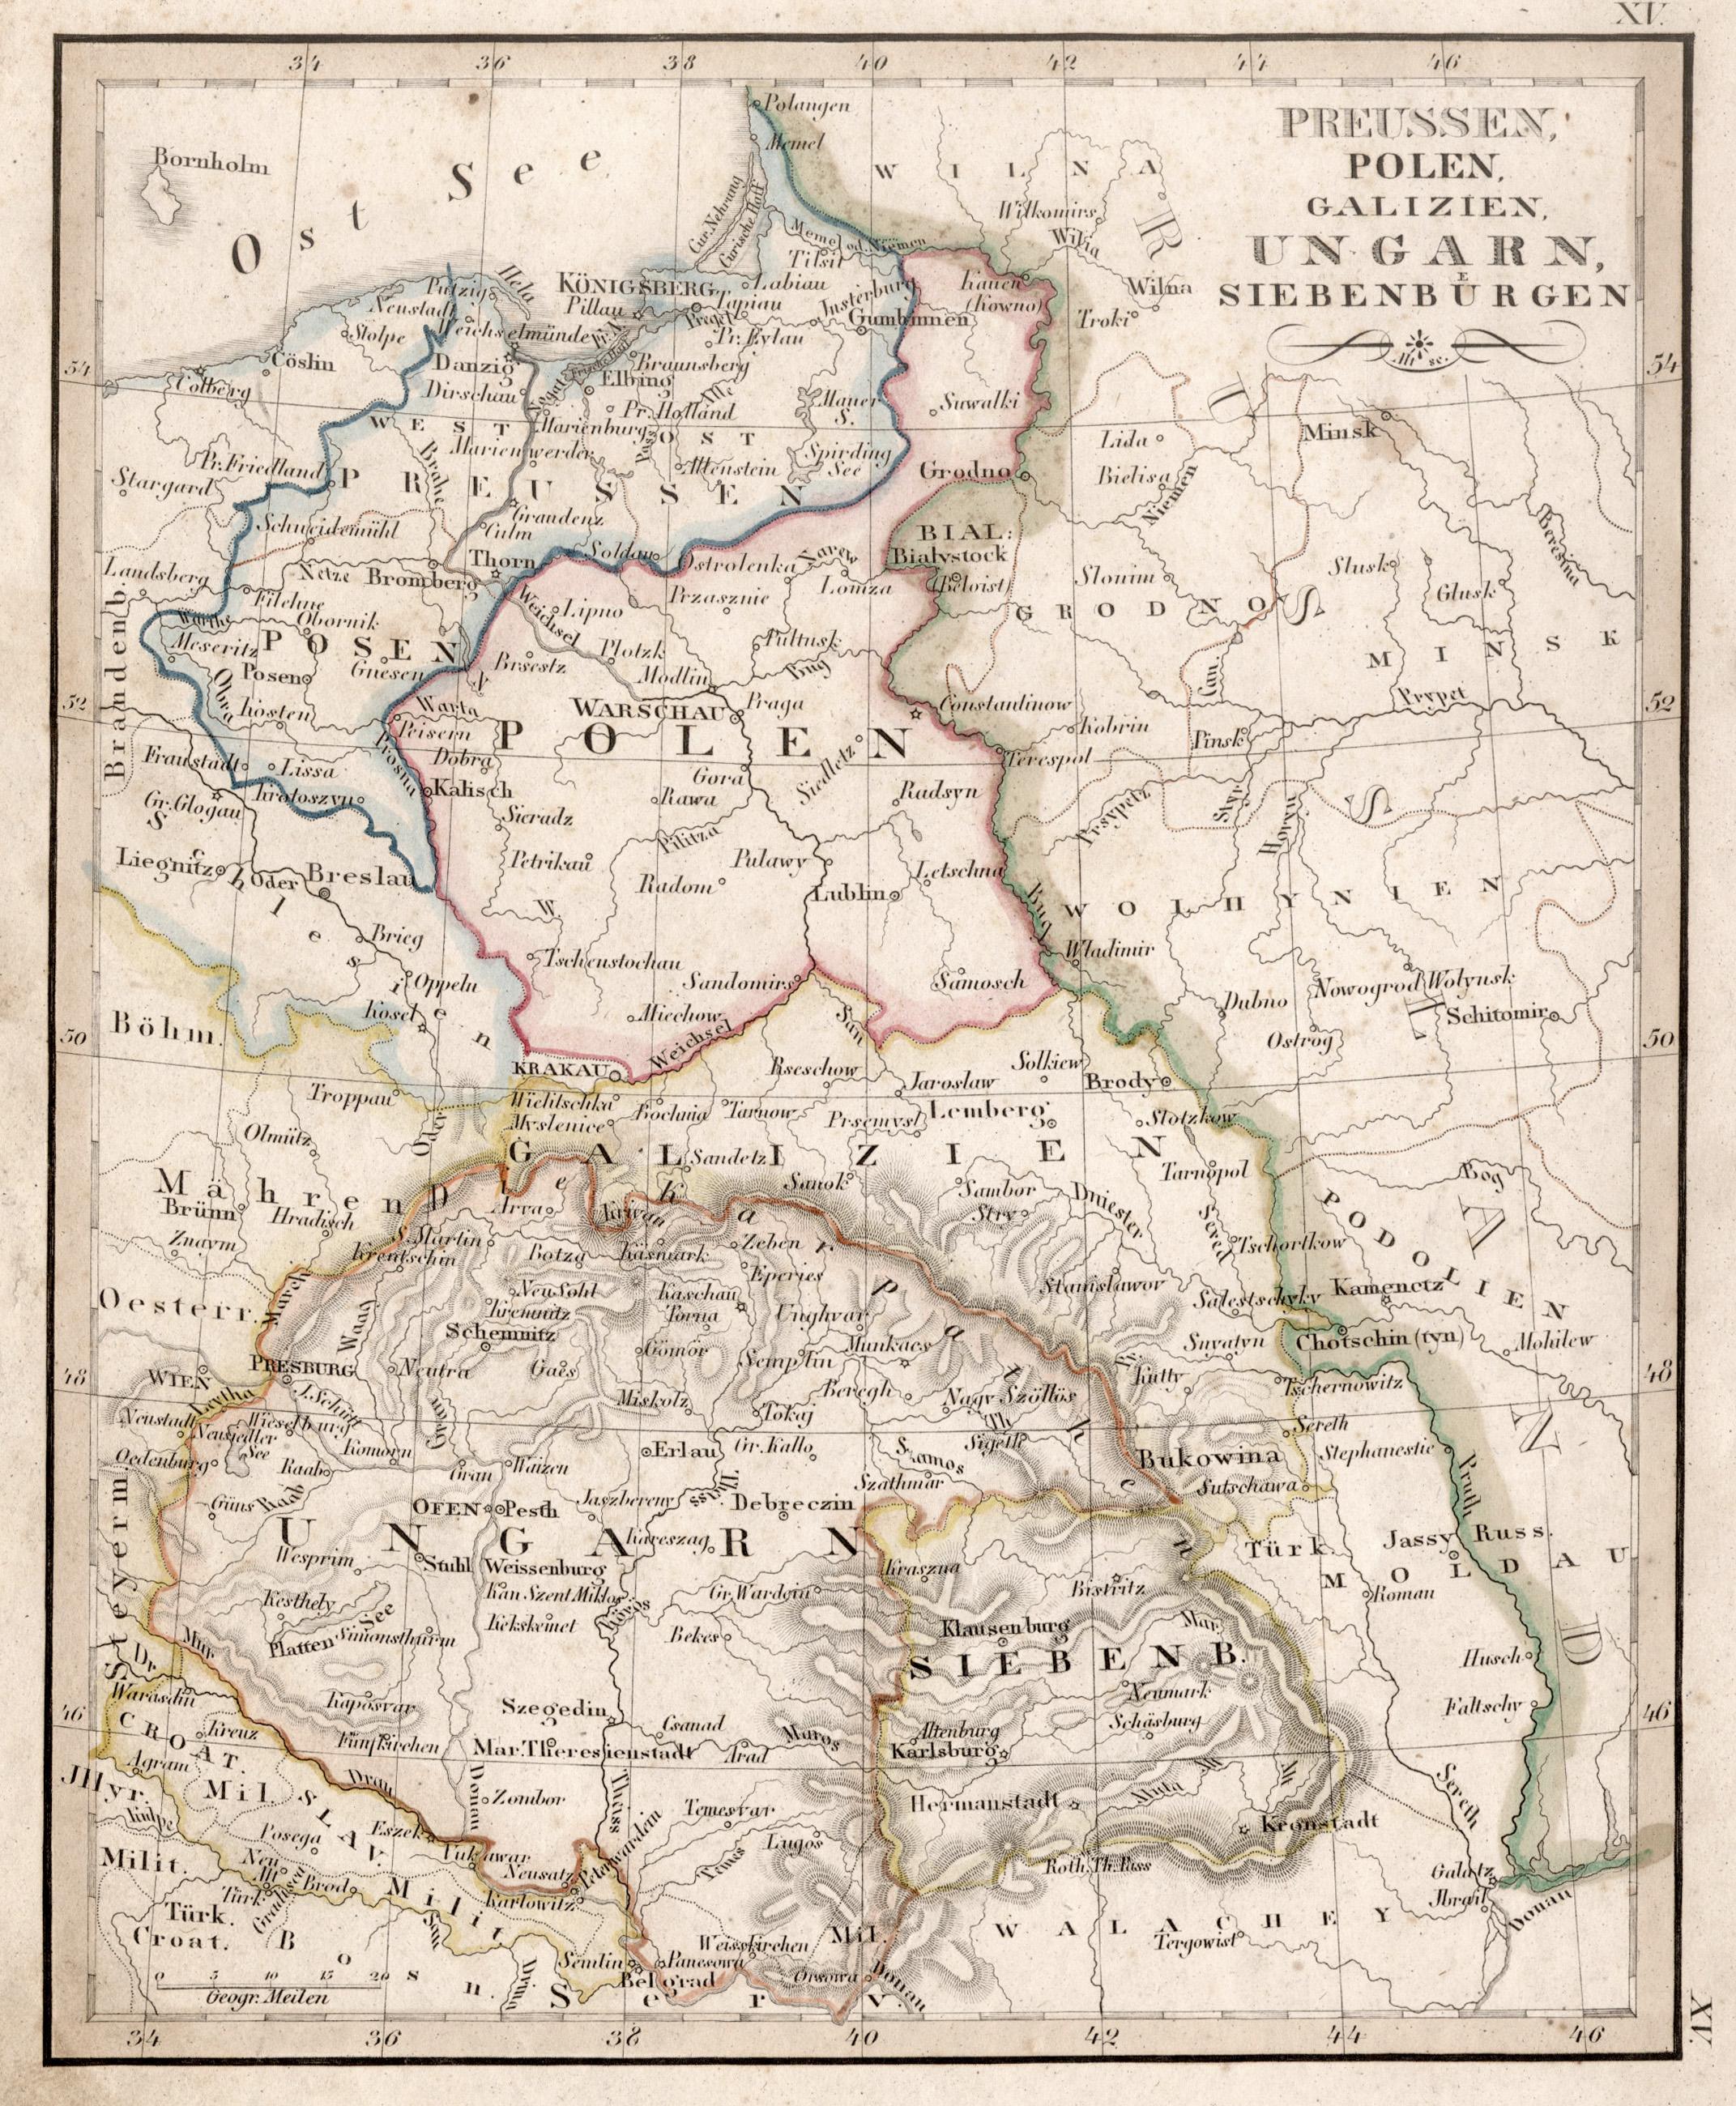 Galizien Karte.Kupferstich Karte M Altem Grenzkolorit